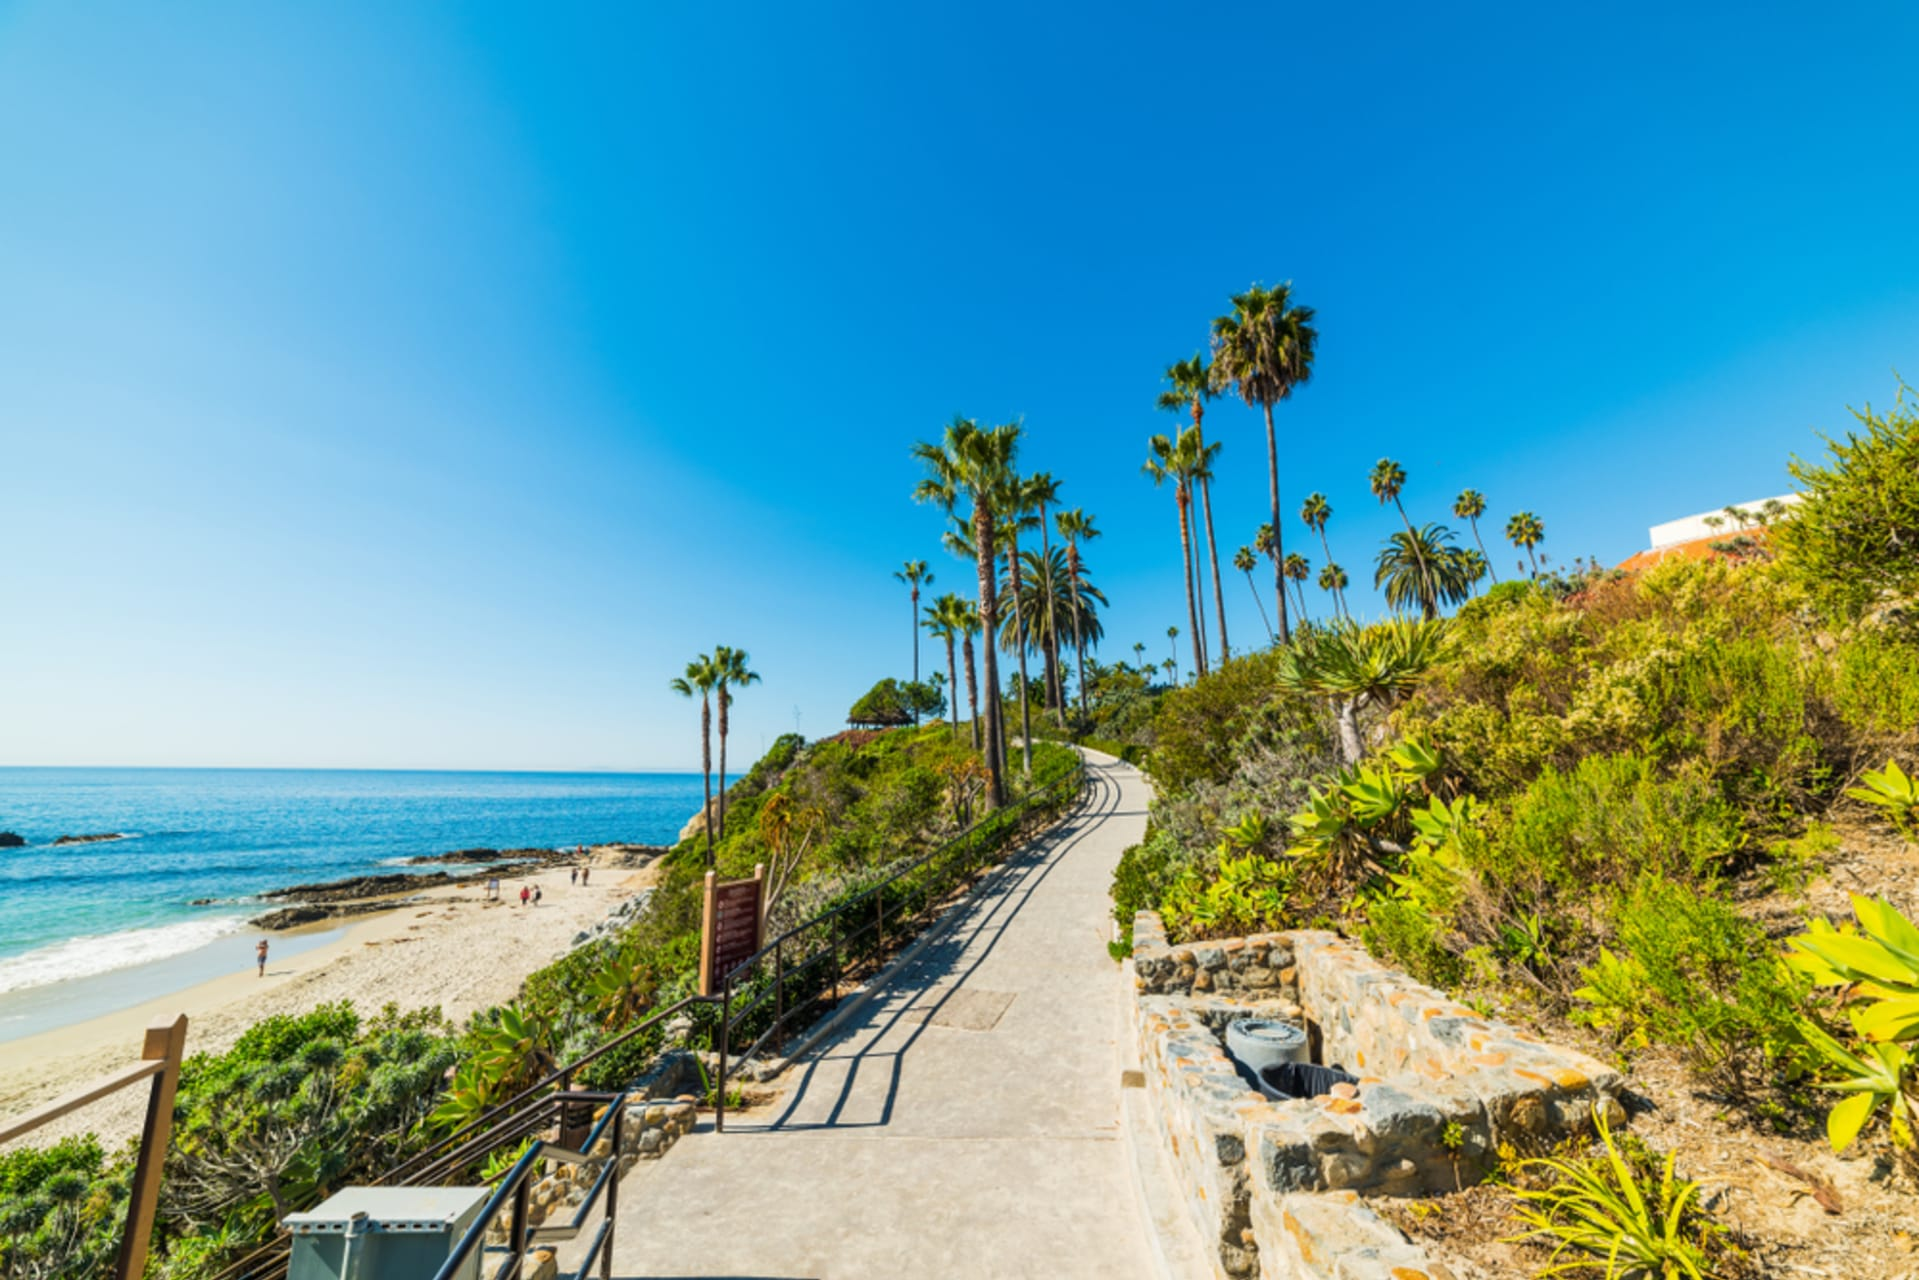 Laguna Beach - Laguna Beach: A Hollywood Hippie Enclave & Thriving Art Community